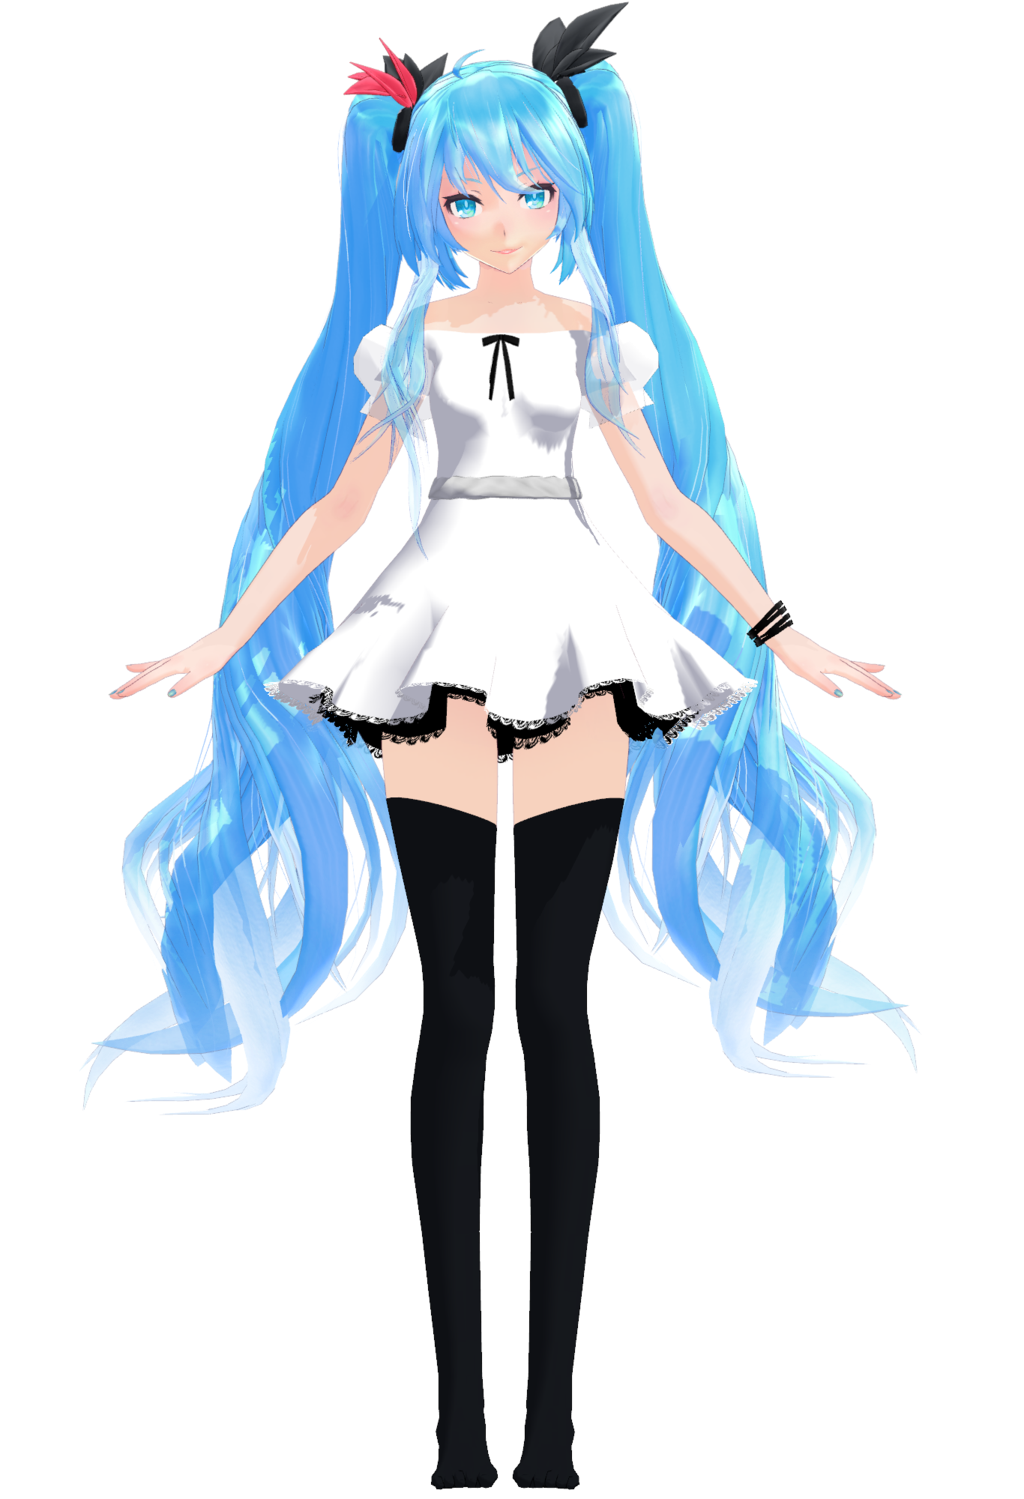 Vocaloid creator deviantart